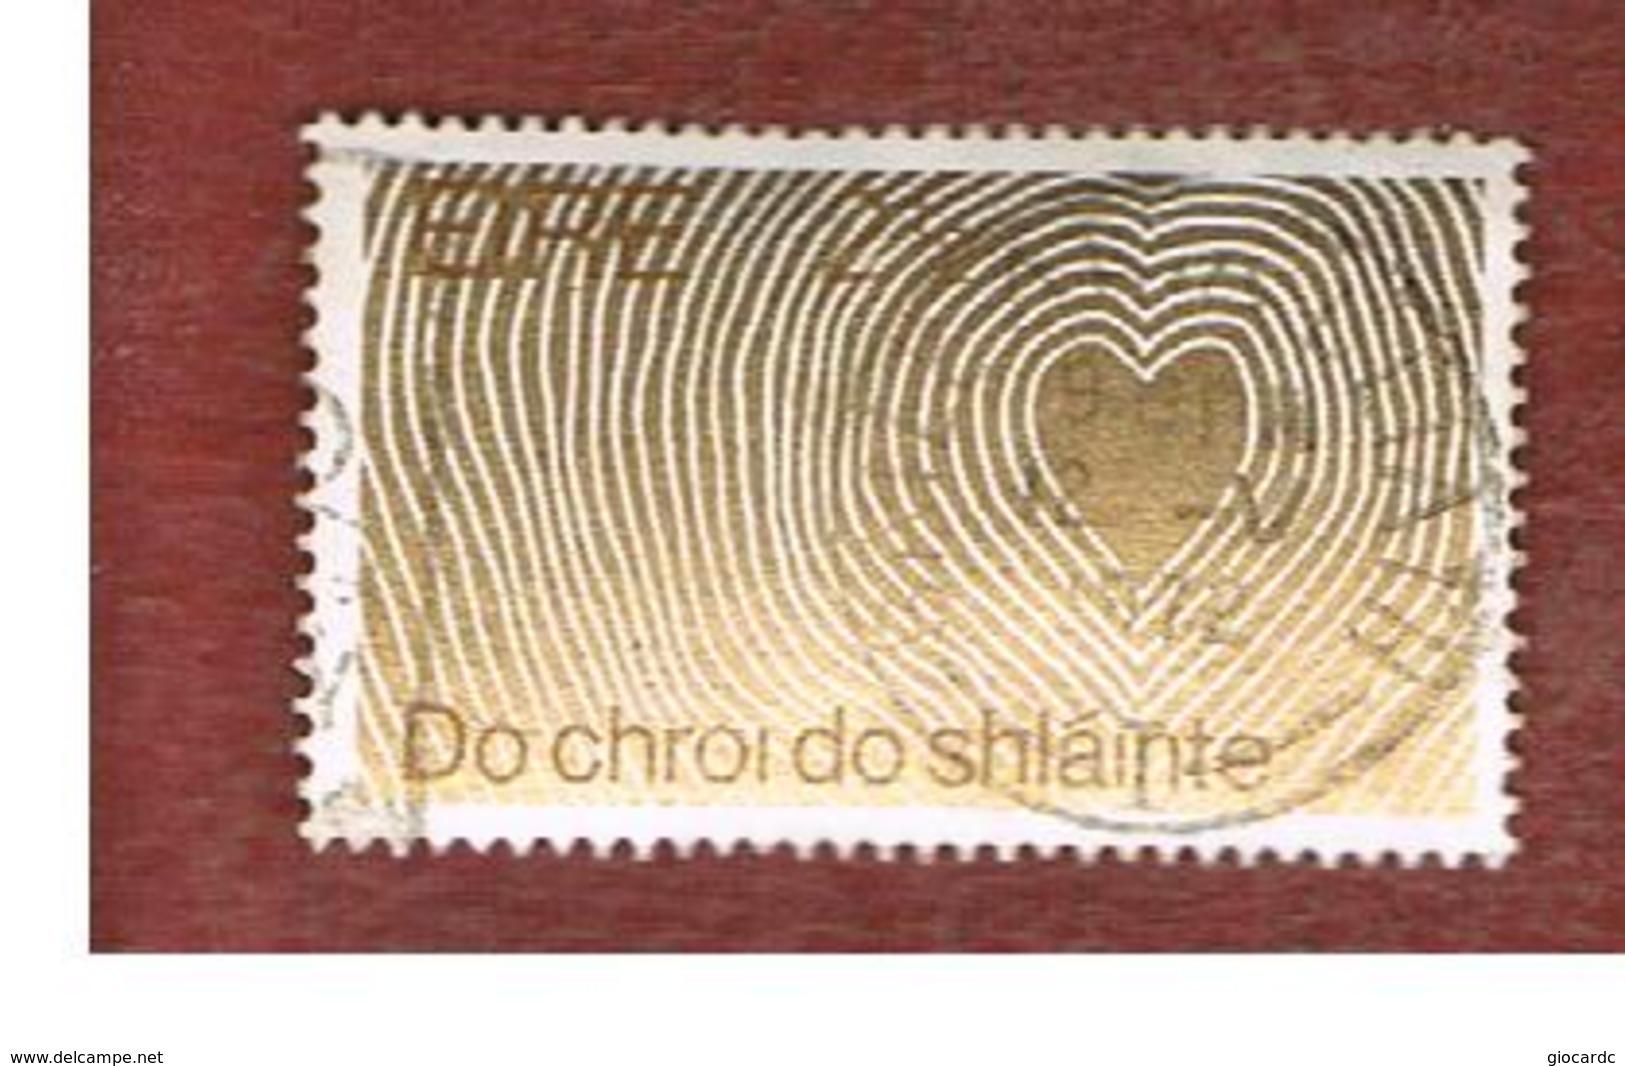 IRLANDA (IRELAND) -  SG 311  -    1972 WORLD HEALTH DAY   - USED - Usati